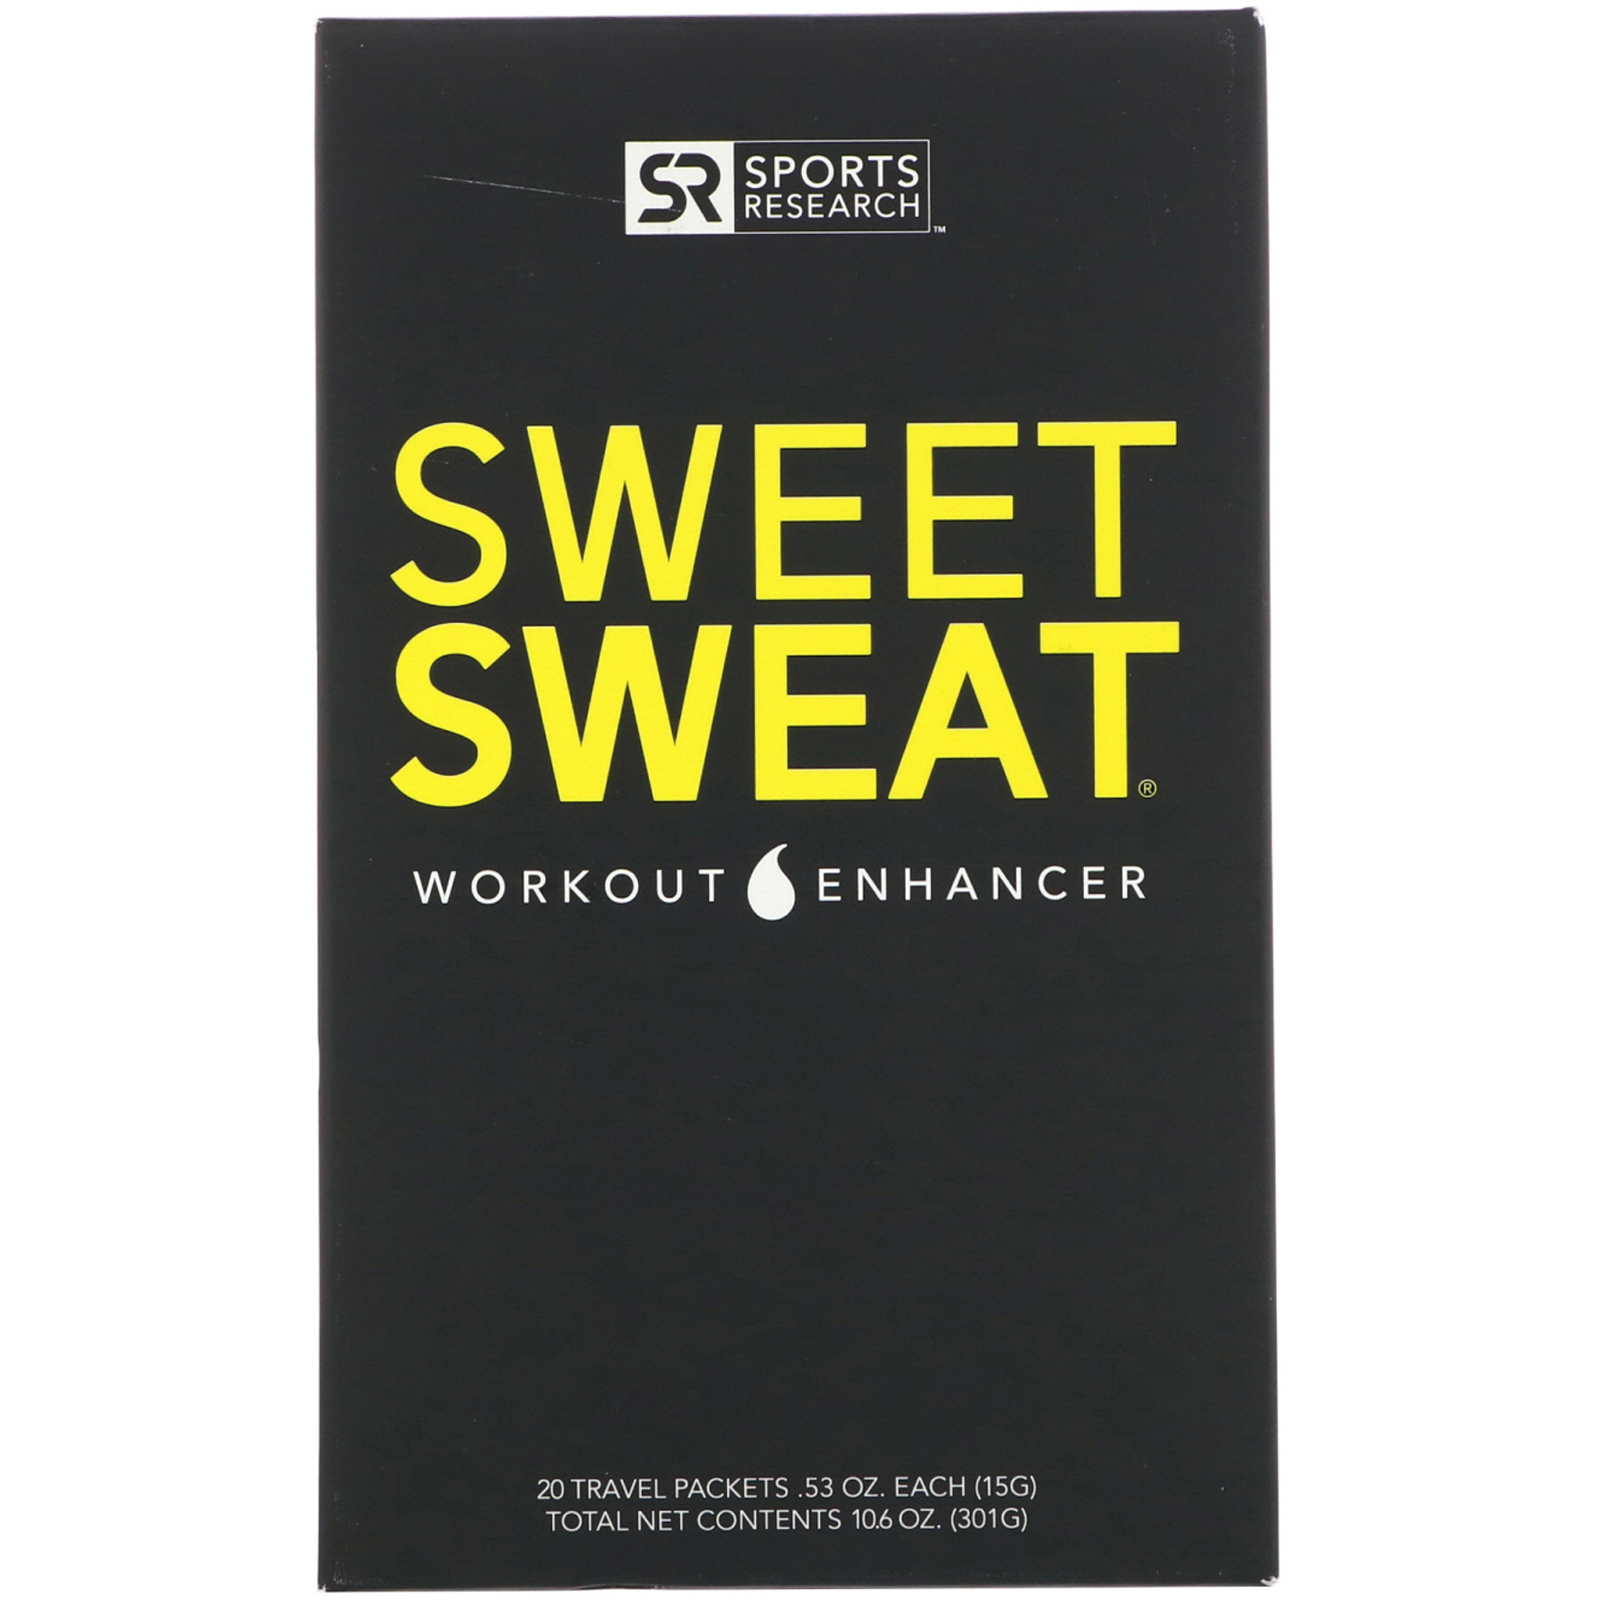 Gym Packet Box, 300 г, Sweet Sweat®